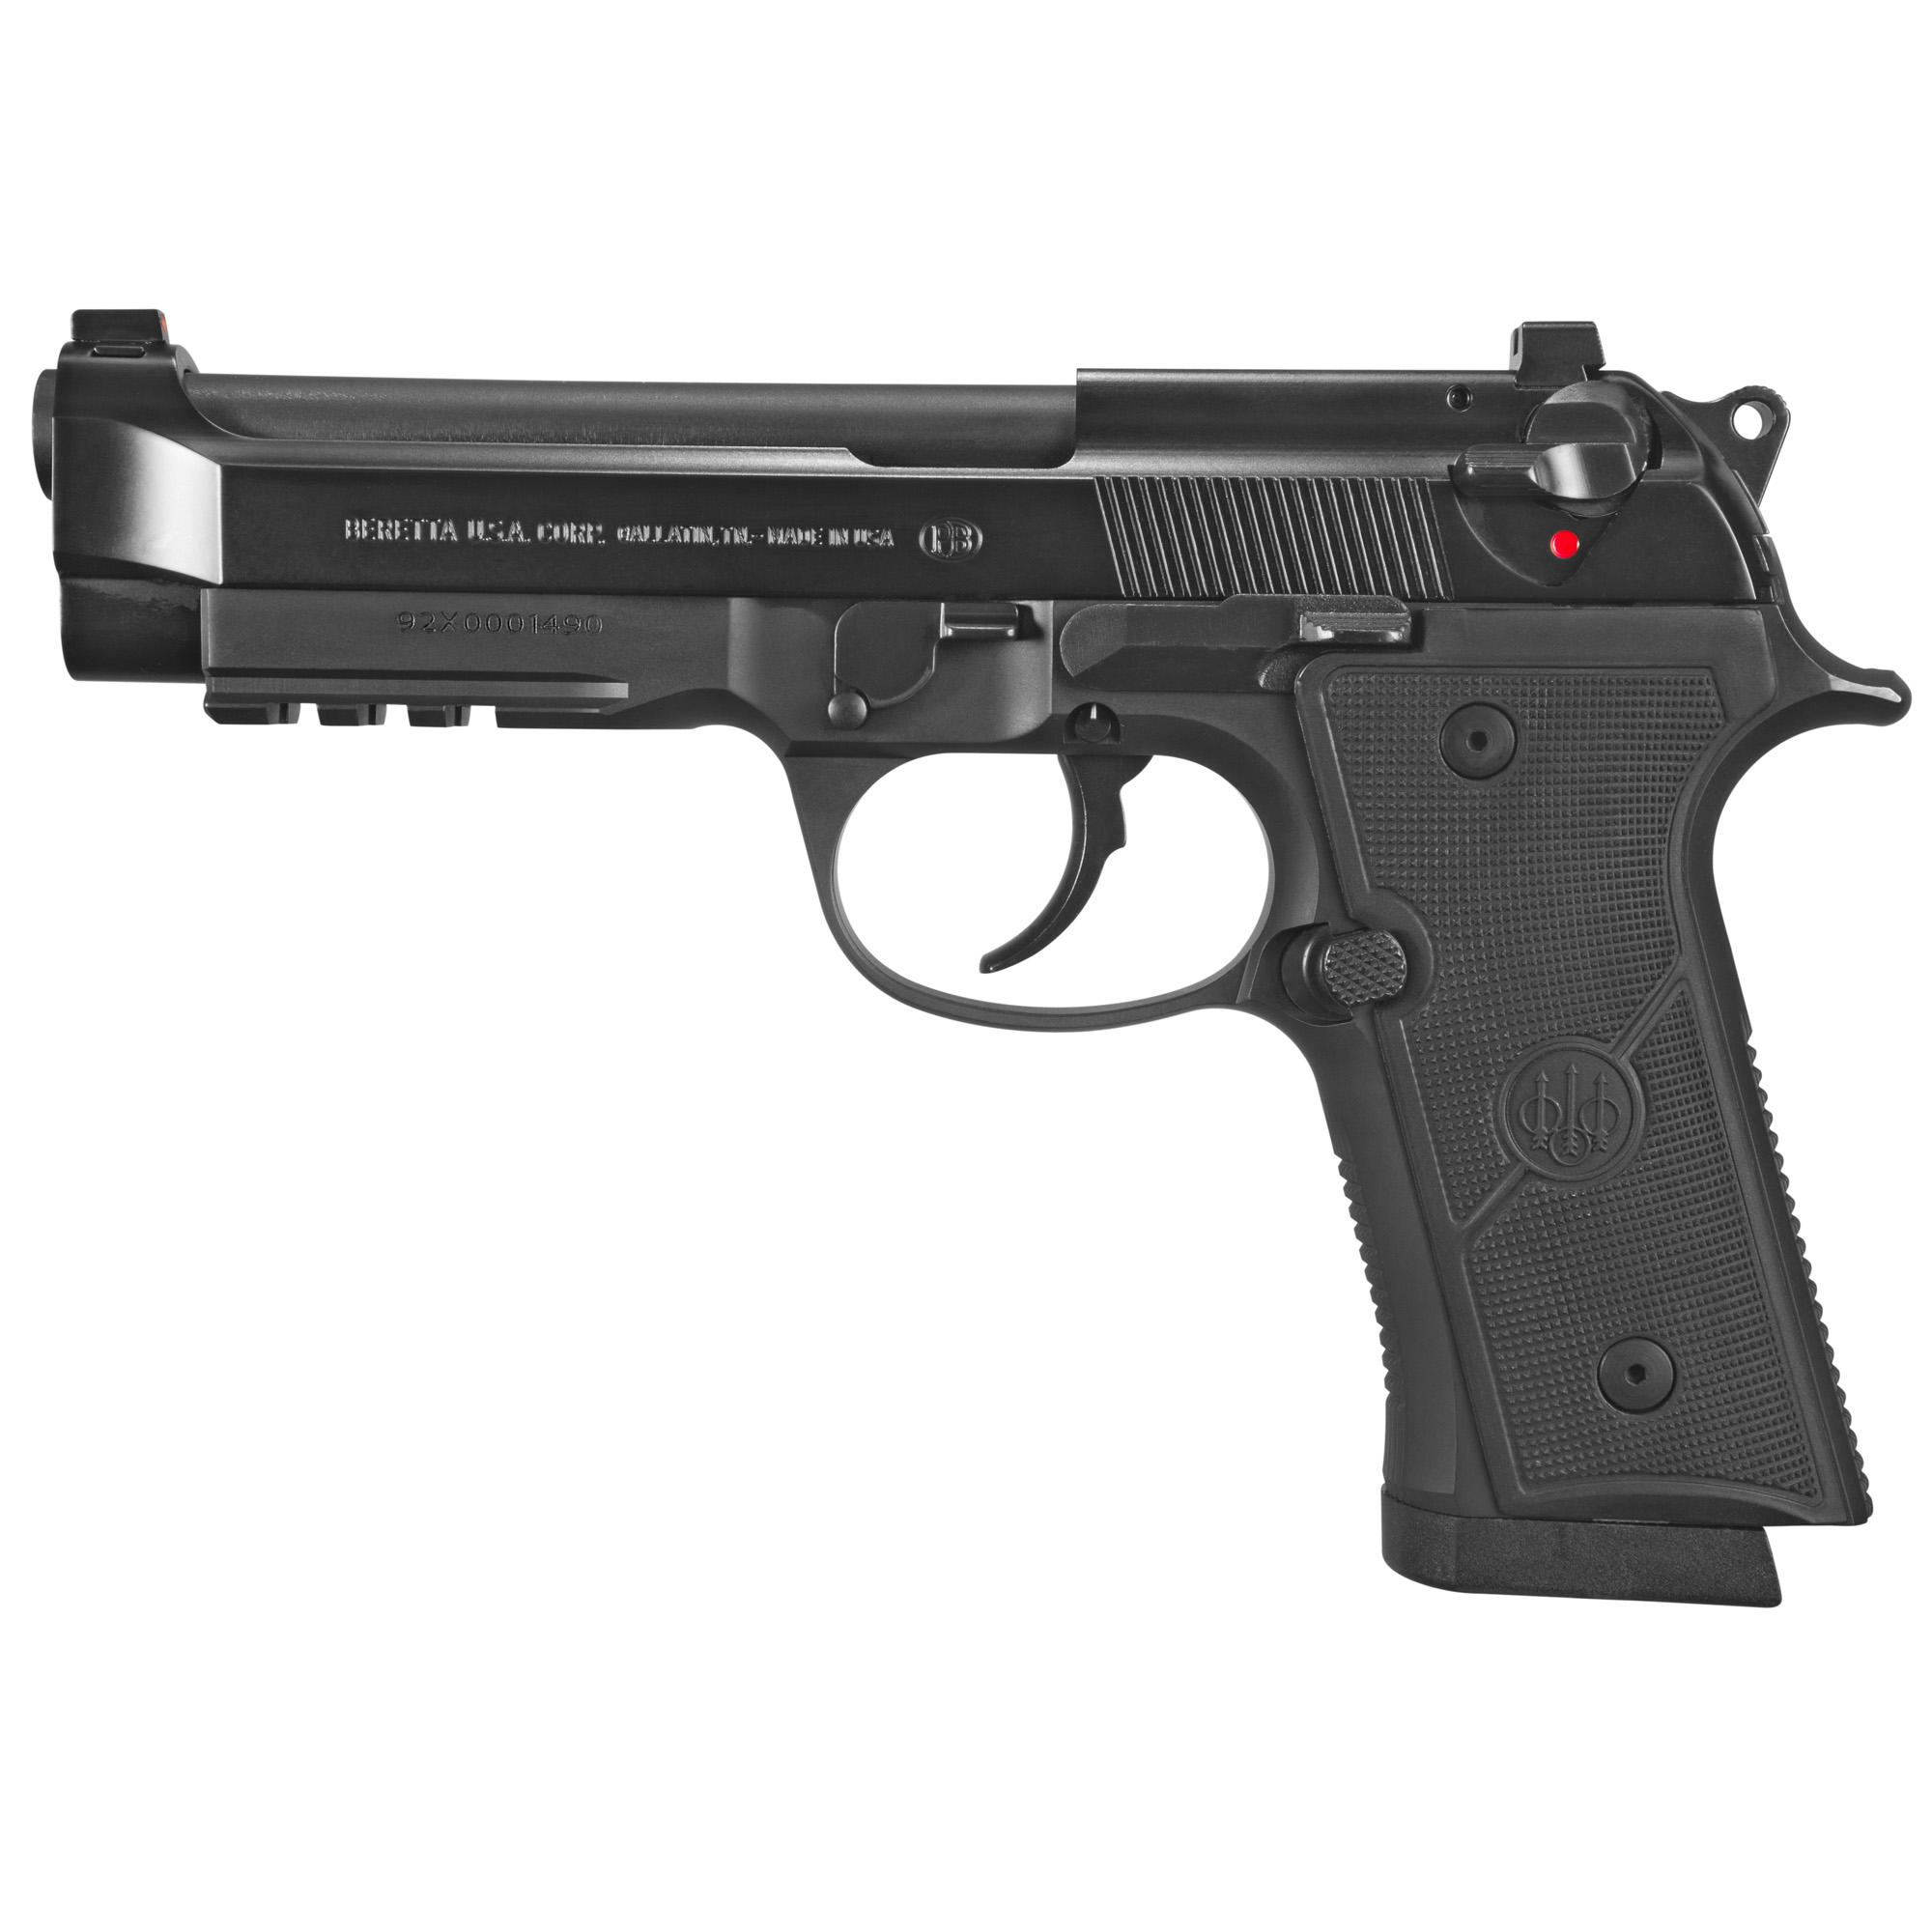 Beretta USA J92FR921G 92X Full Size 9mm Luger 4.70